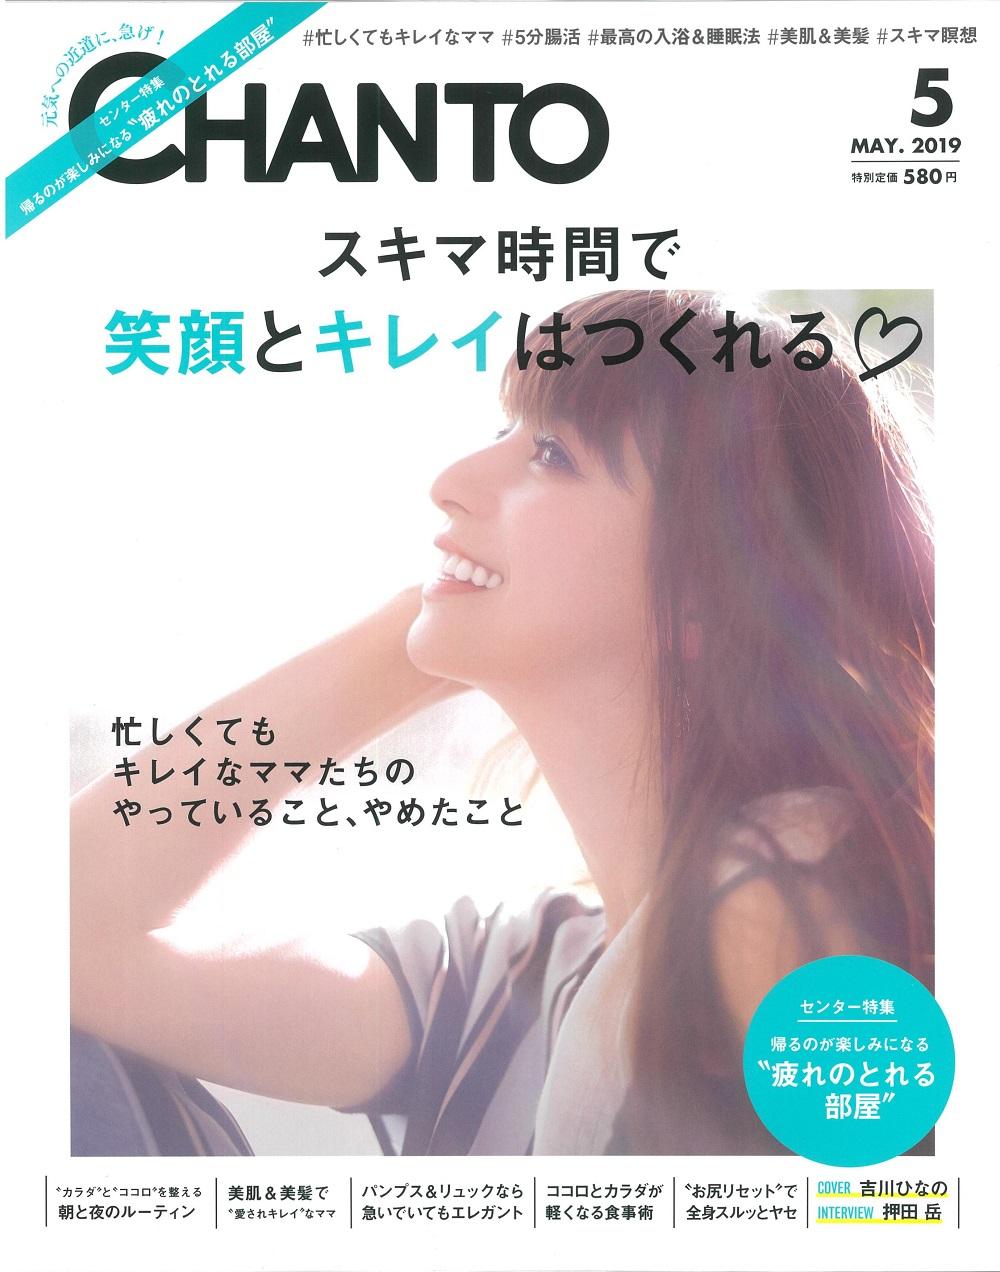 20190406_CHANTO5月号_COVER.jpg